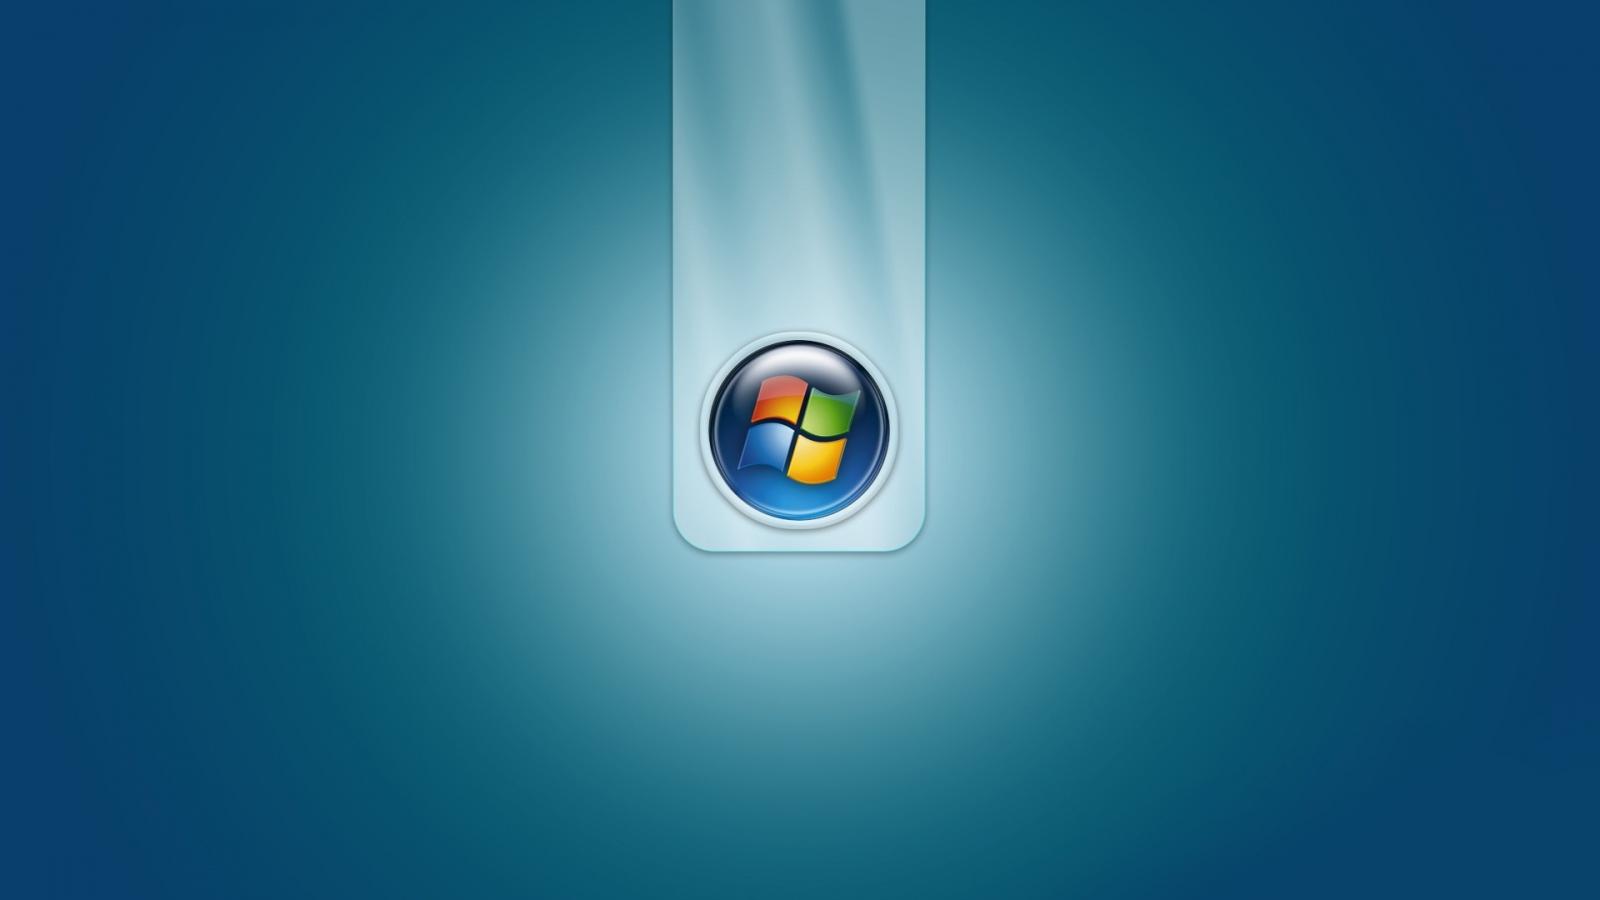 1600x900 Windows 7 Blue Logo White Yellow Wallpaper Background 1600x900